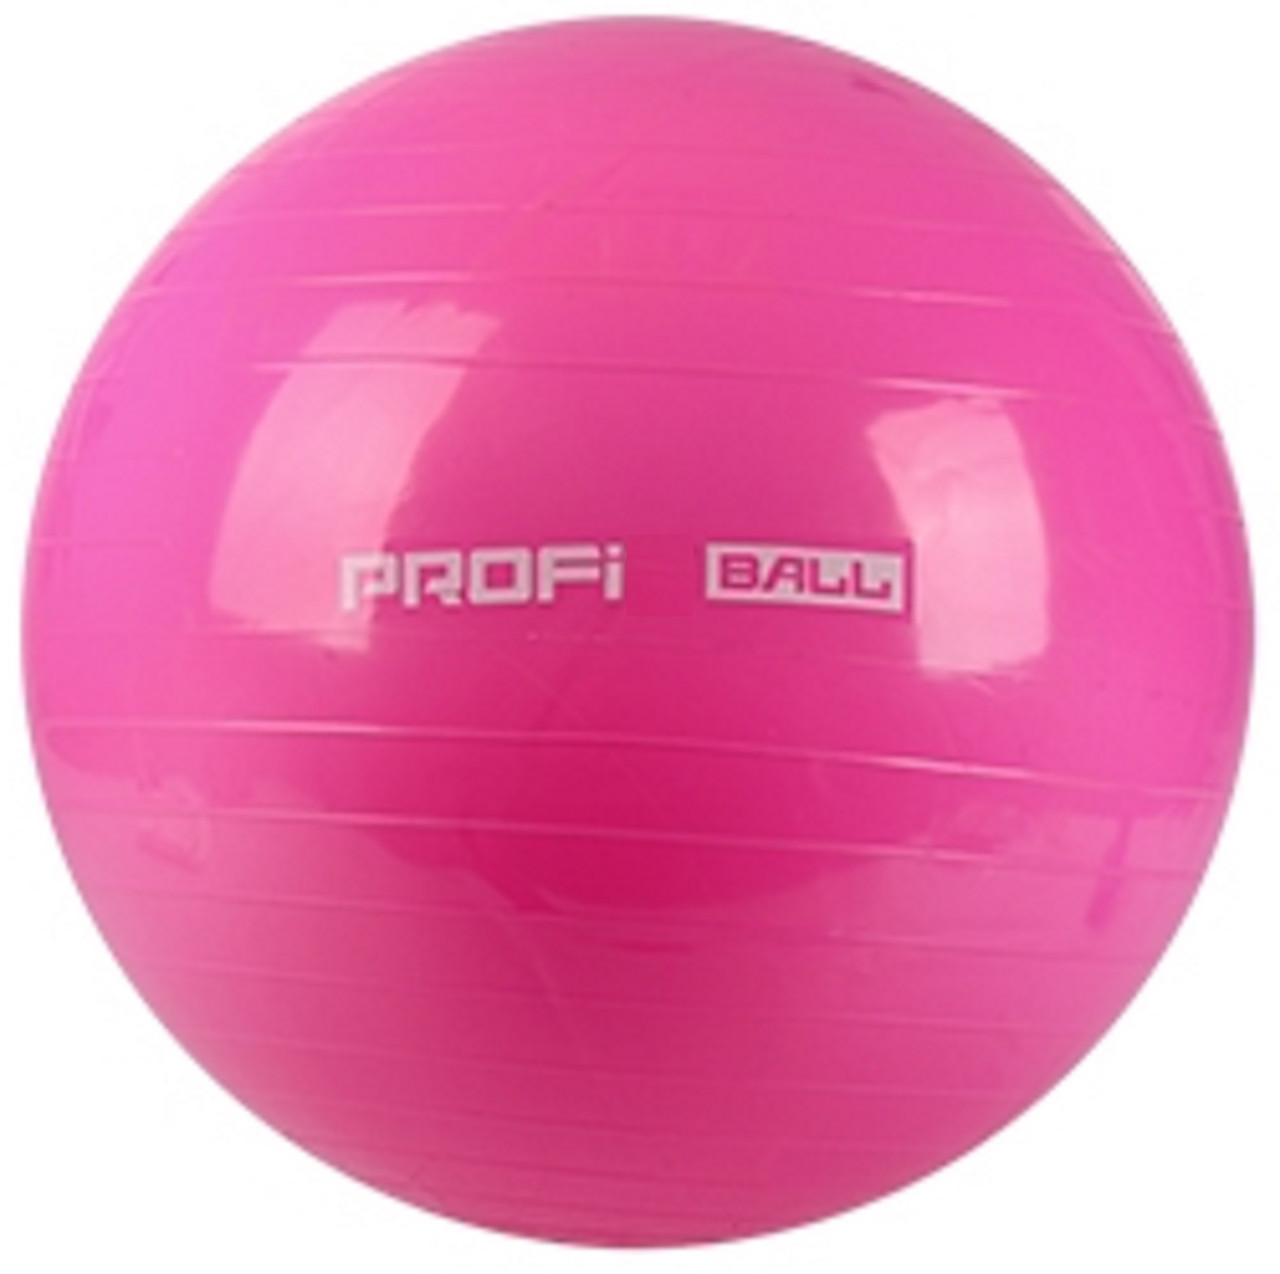 Фитбол 85 см Profi Ball (MS 0384) Розовый